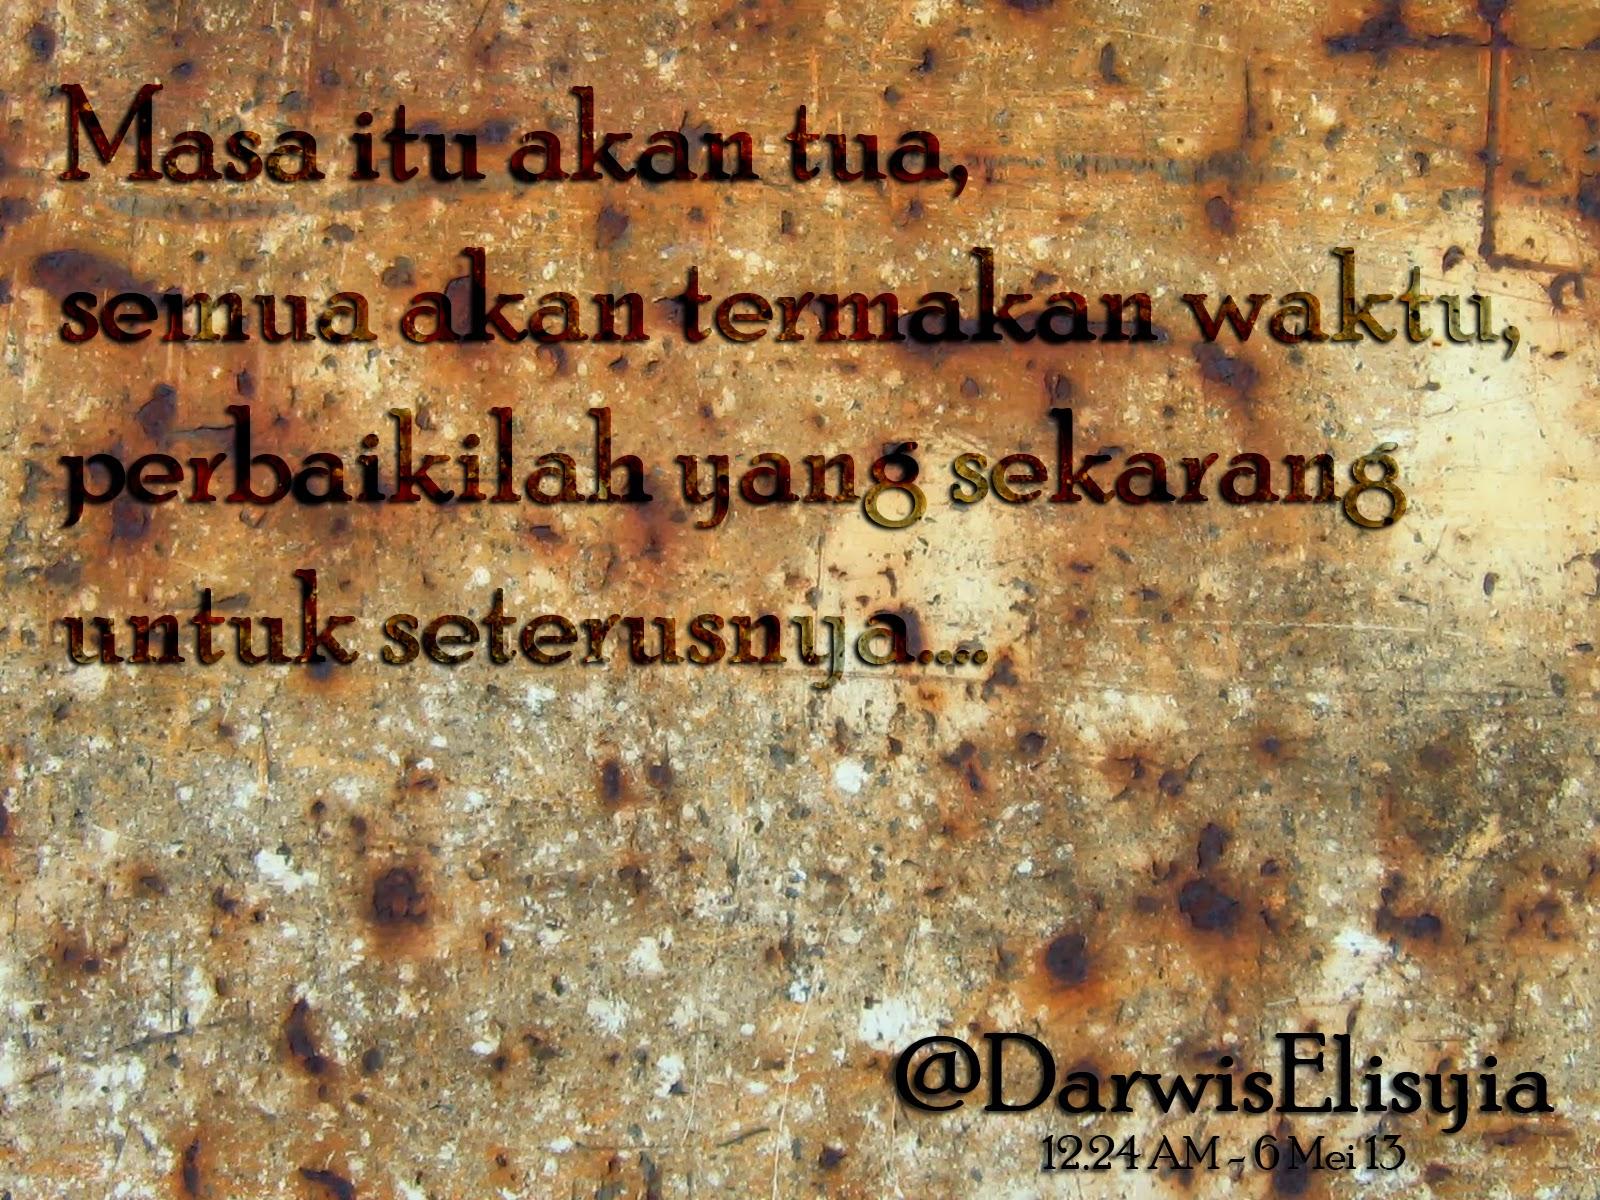 @DarwisElisyia